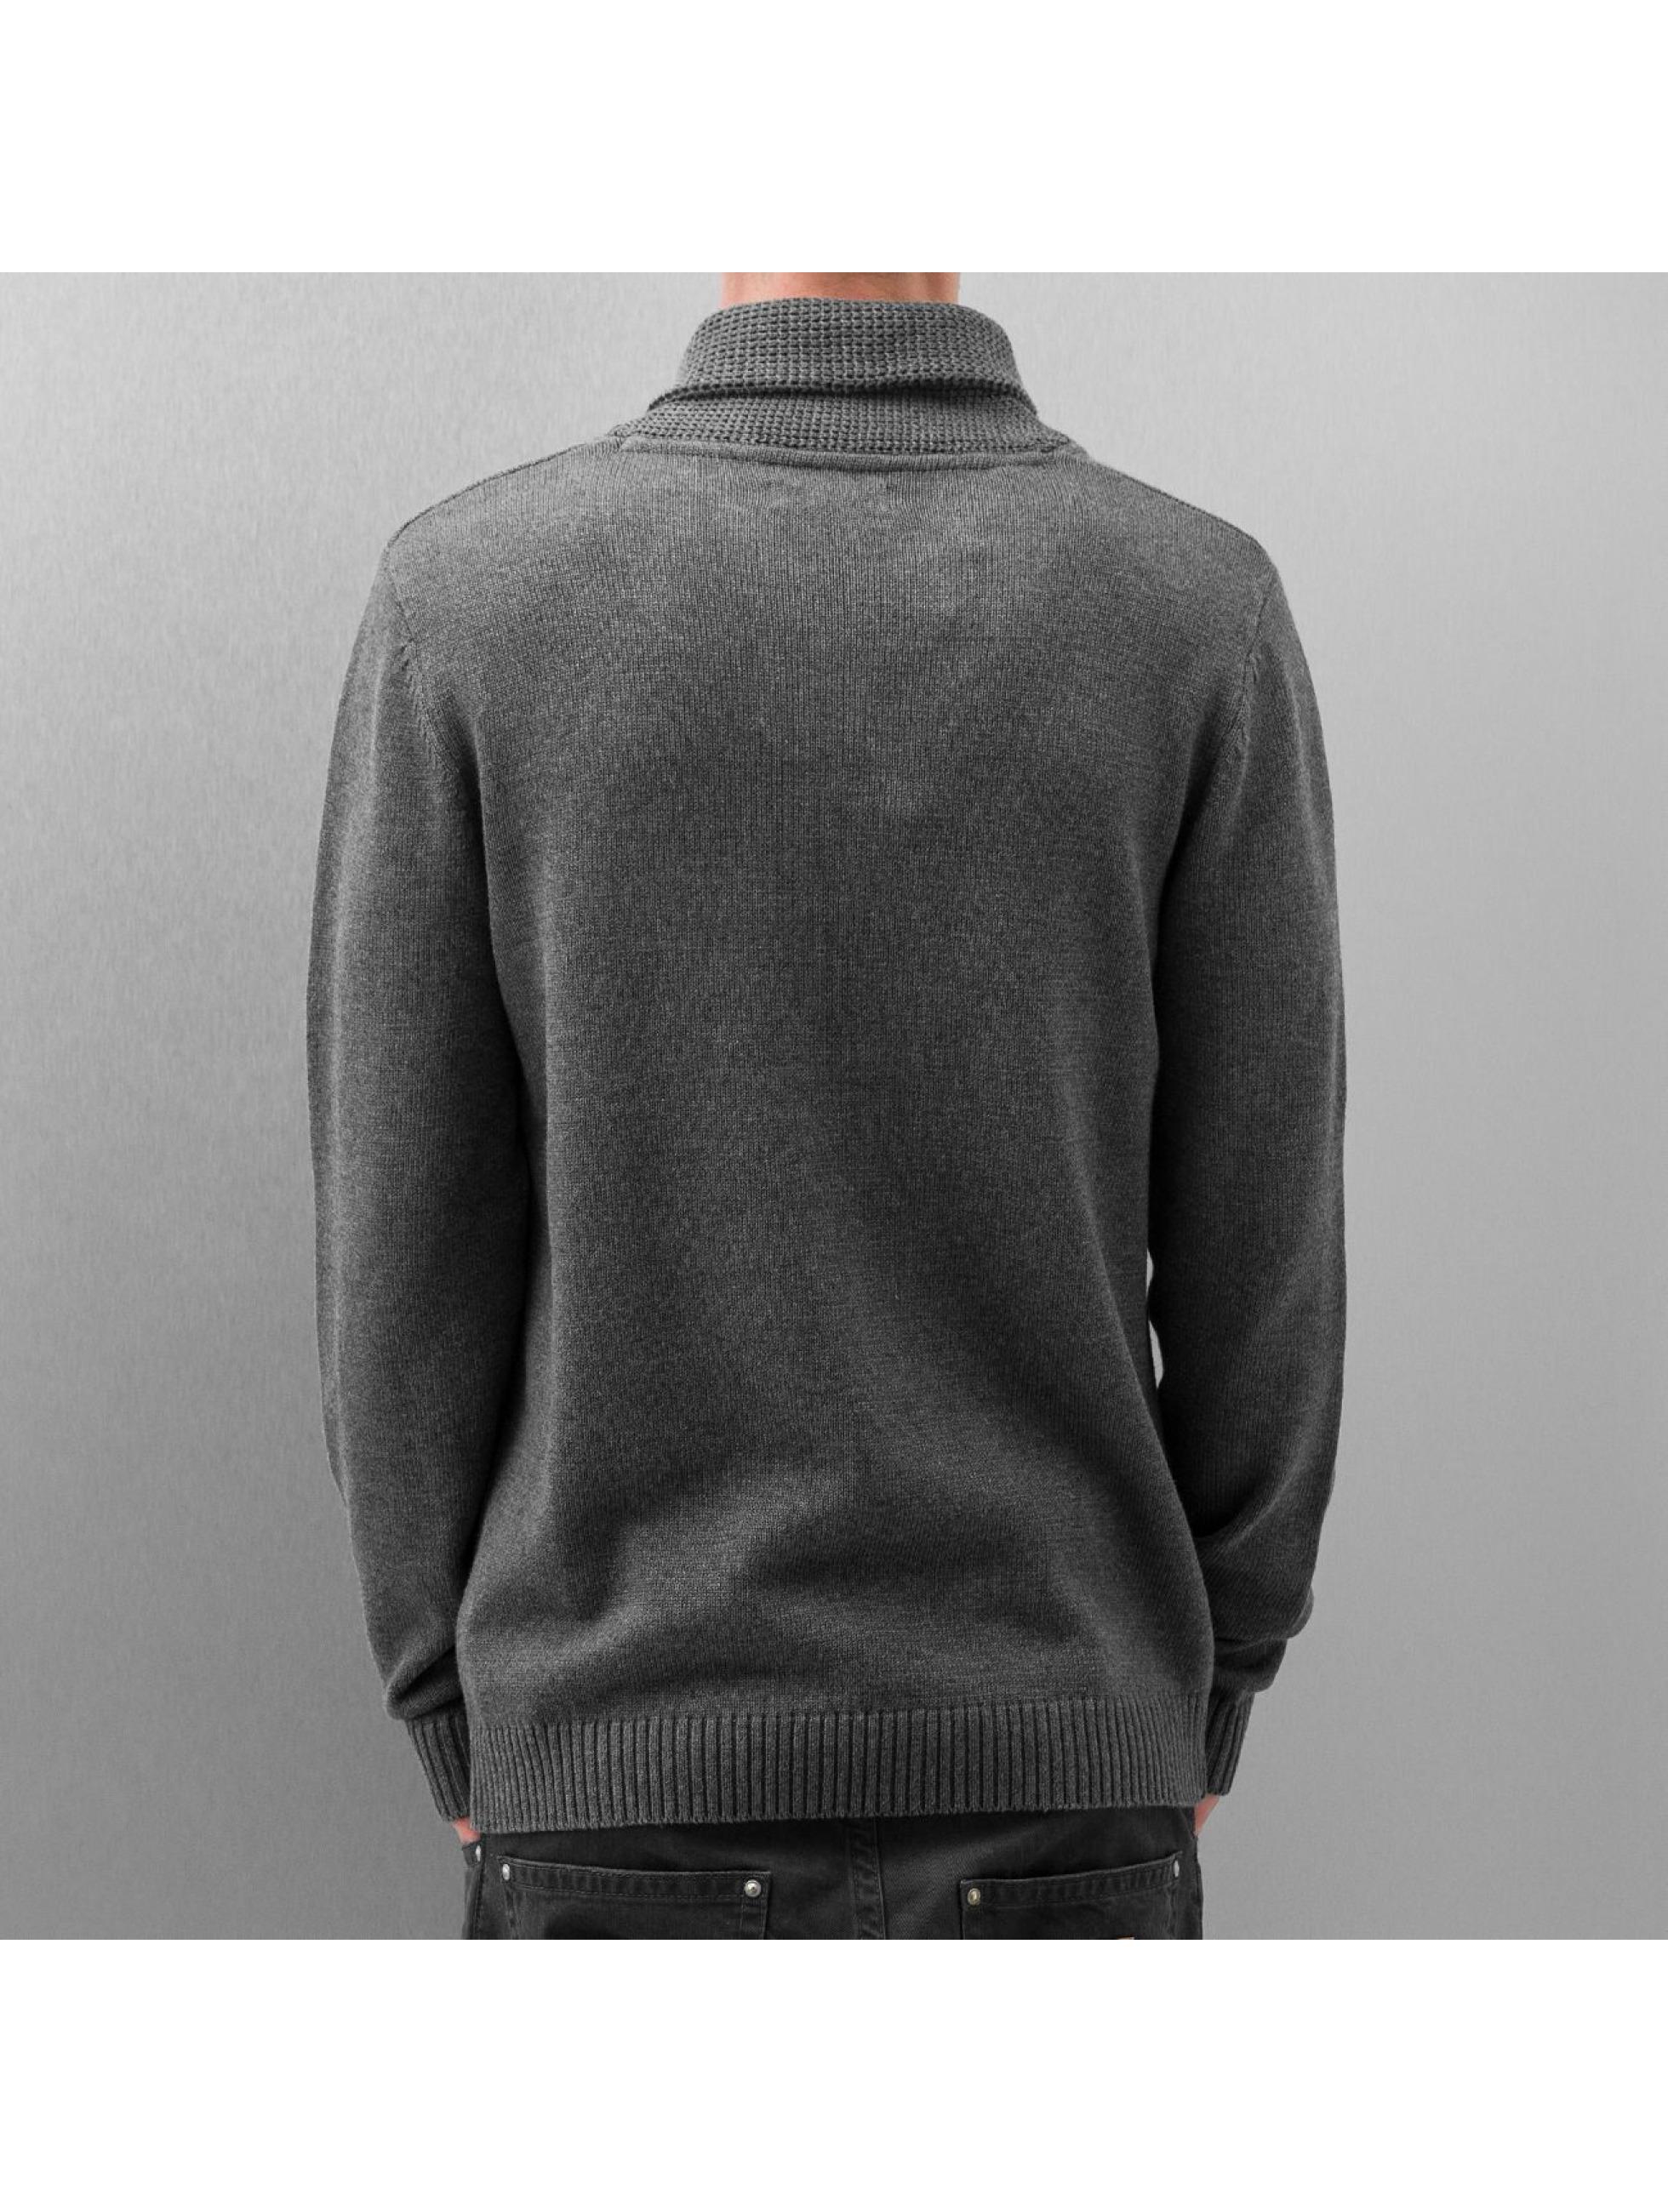 Selected Пуловер Chip Shawl серый